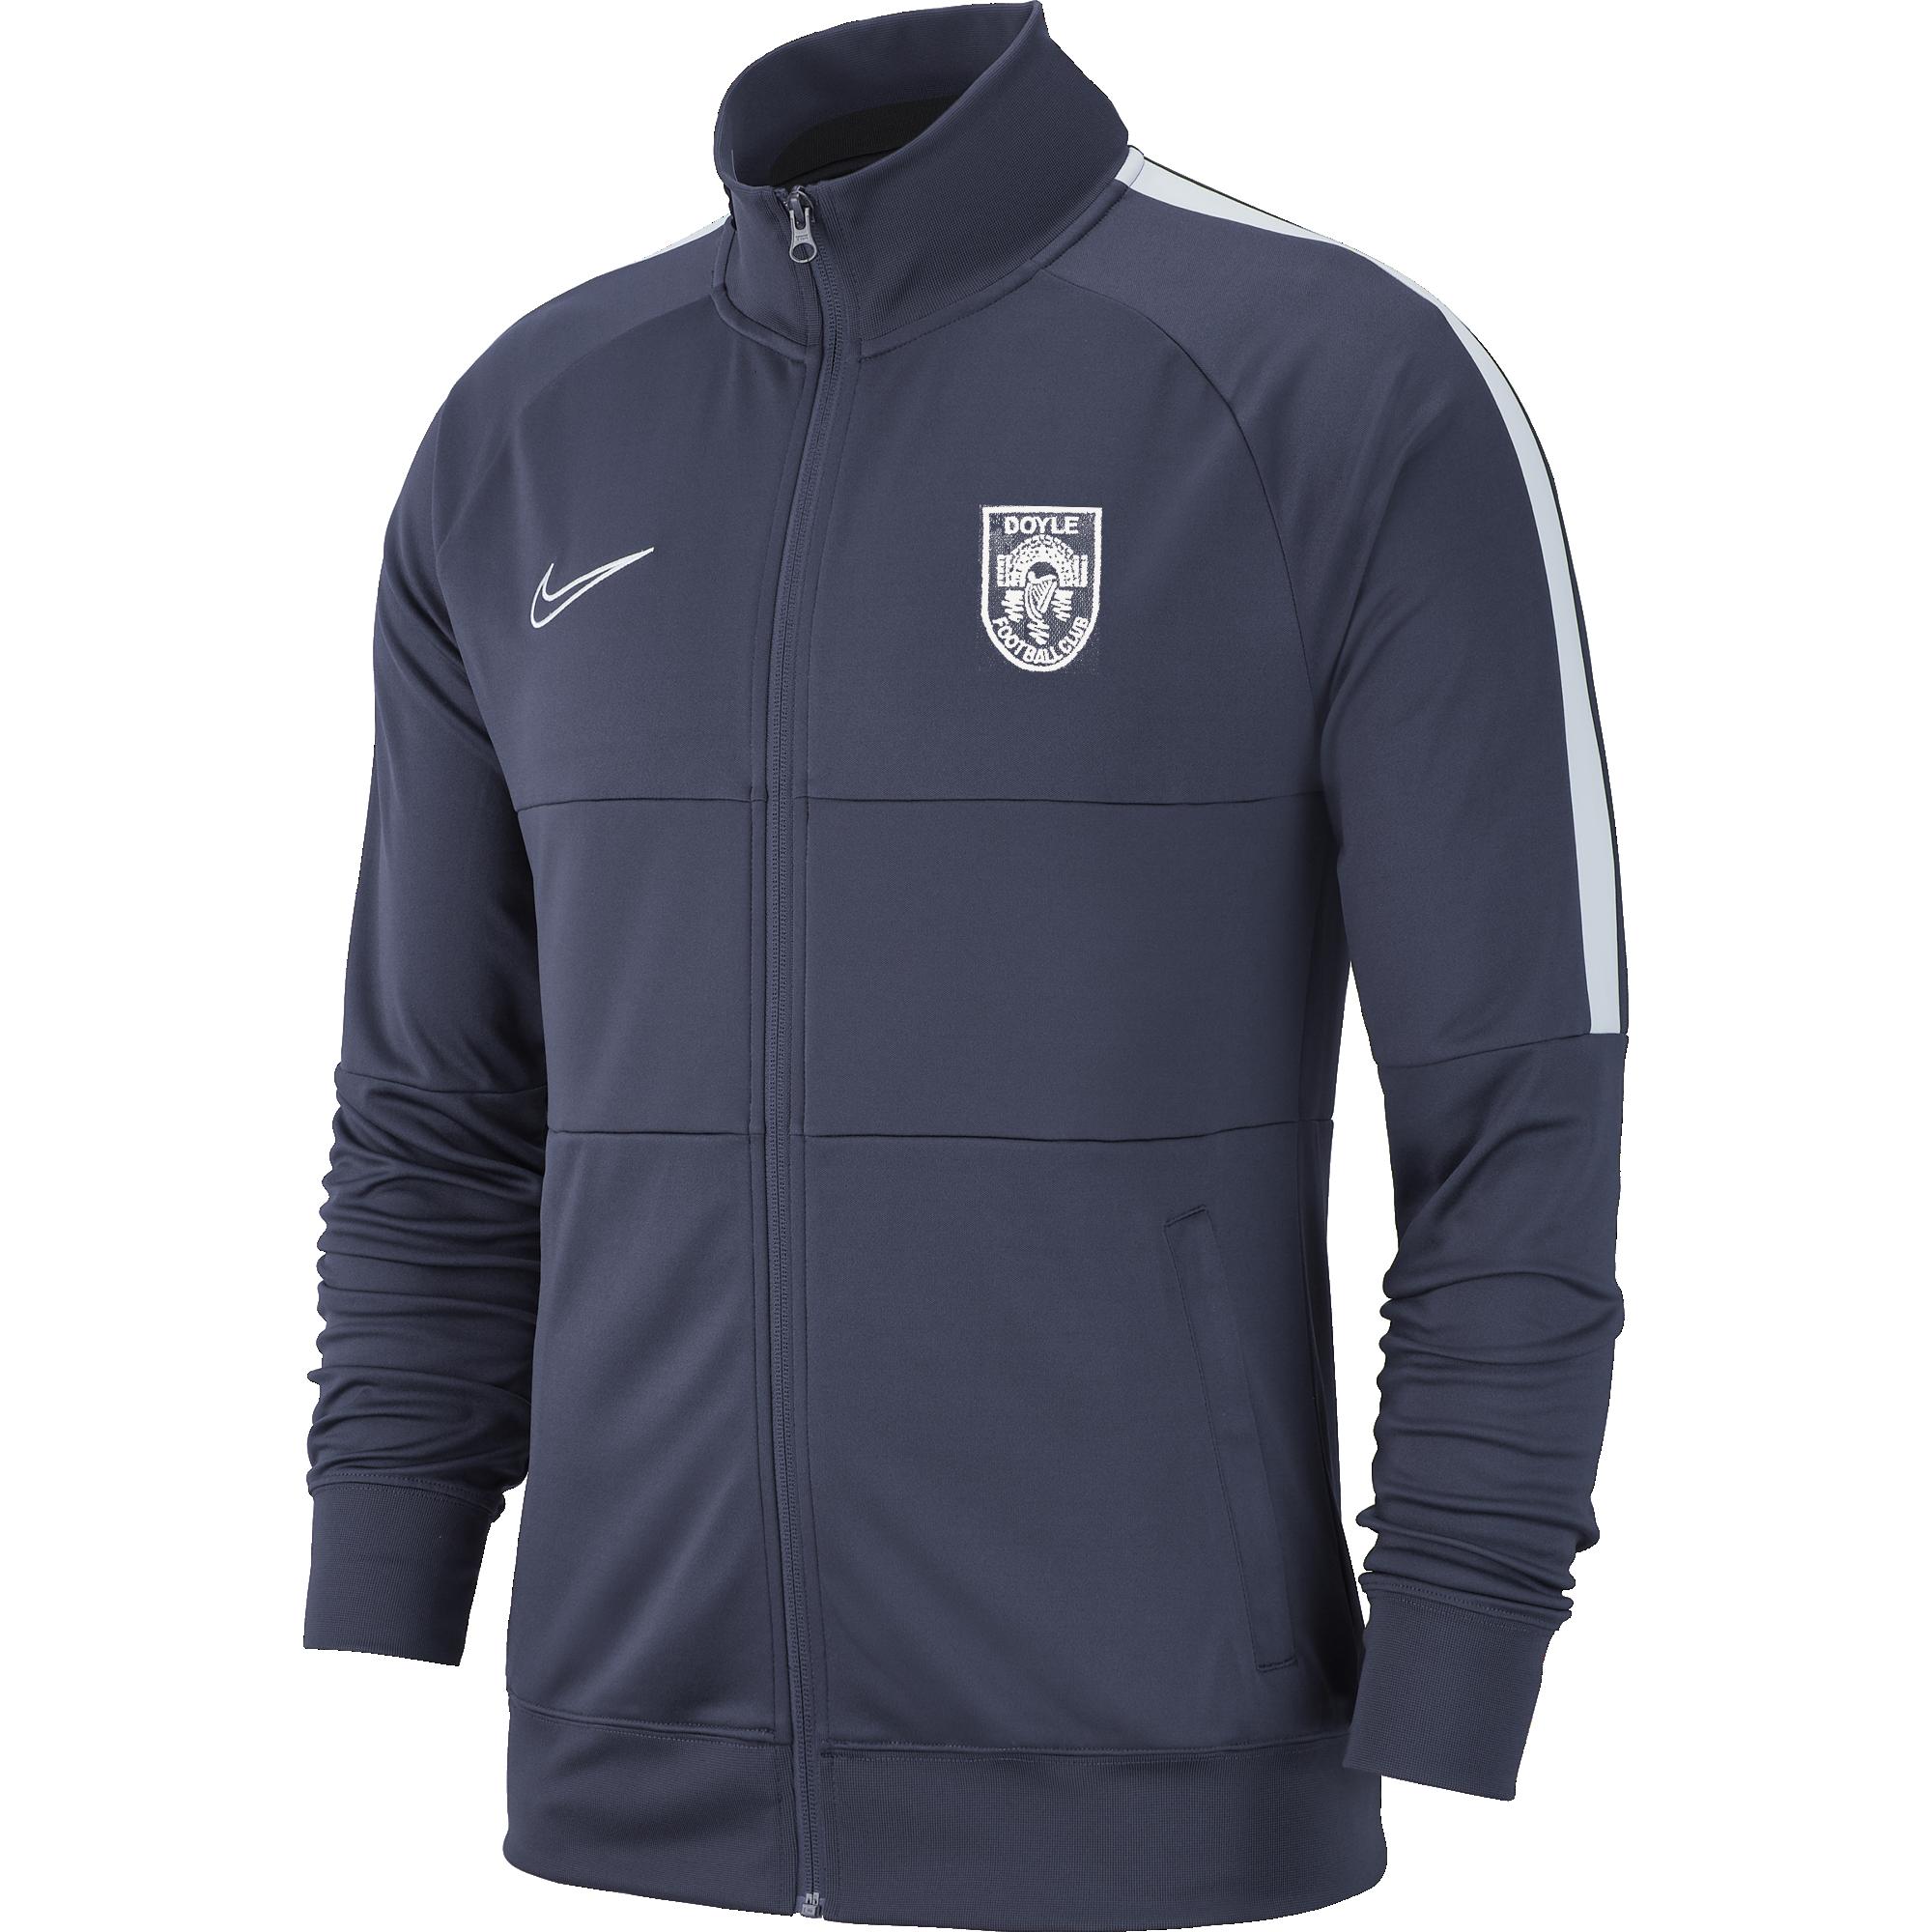 doyle fc academy 18 jacket 22491 p